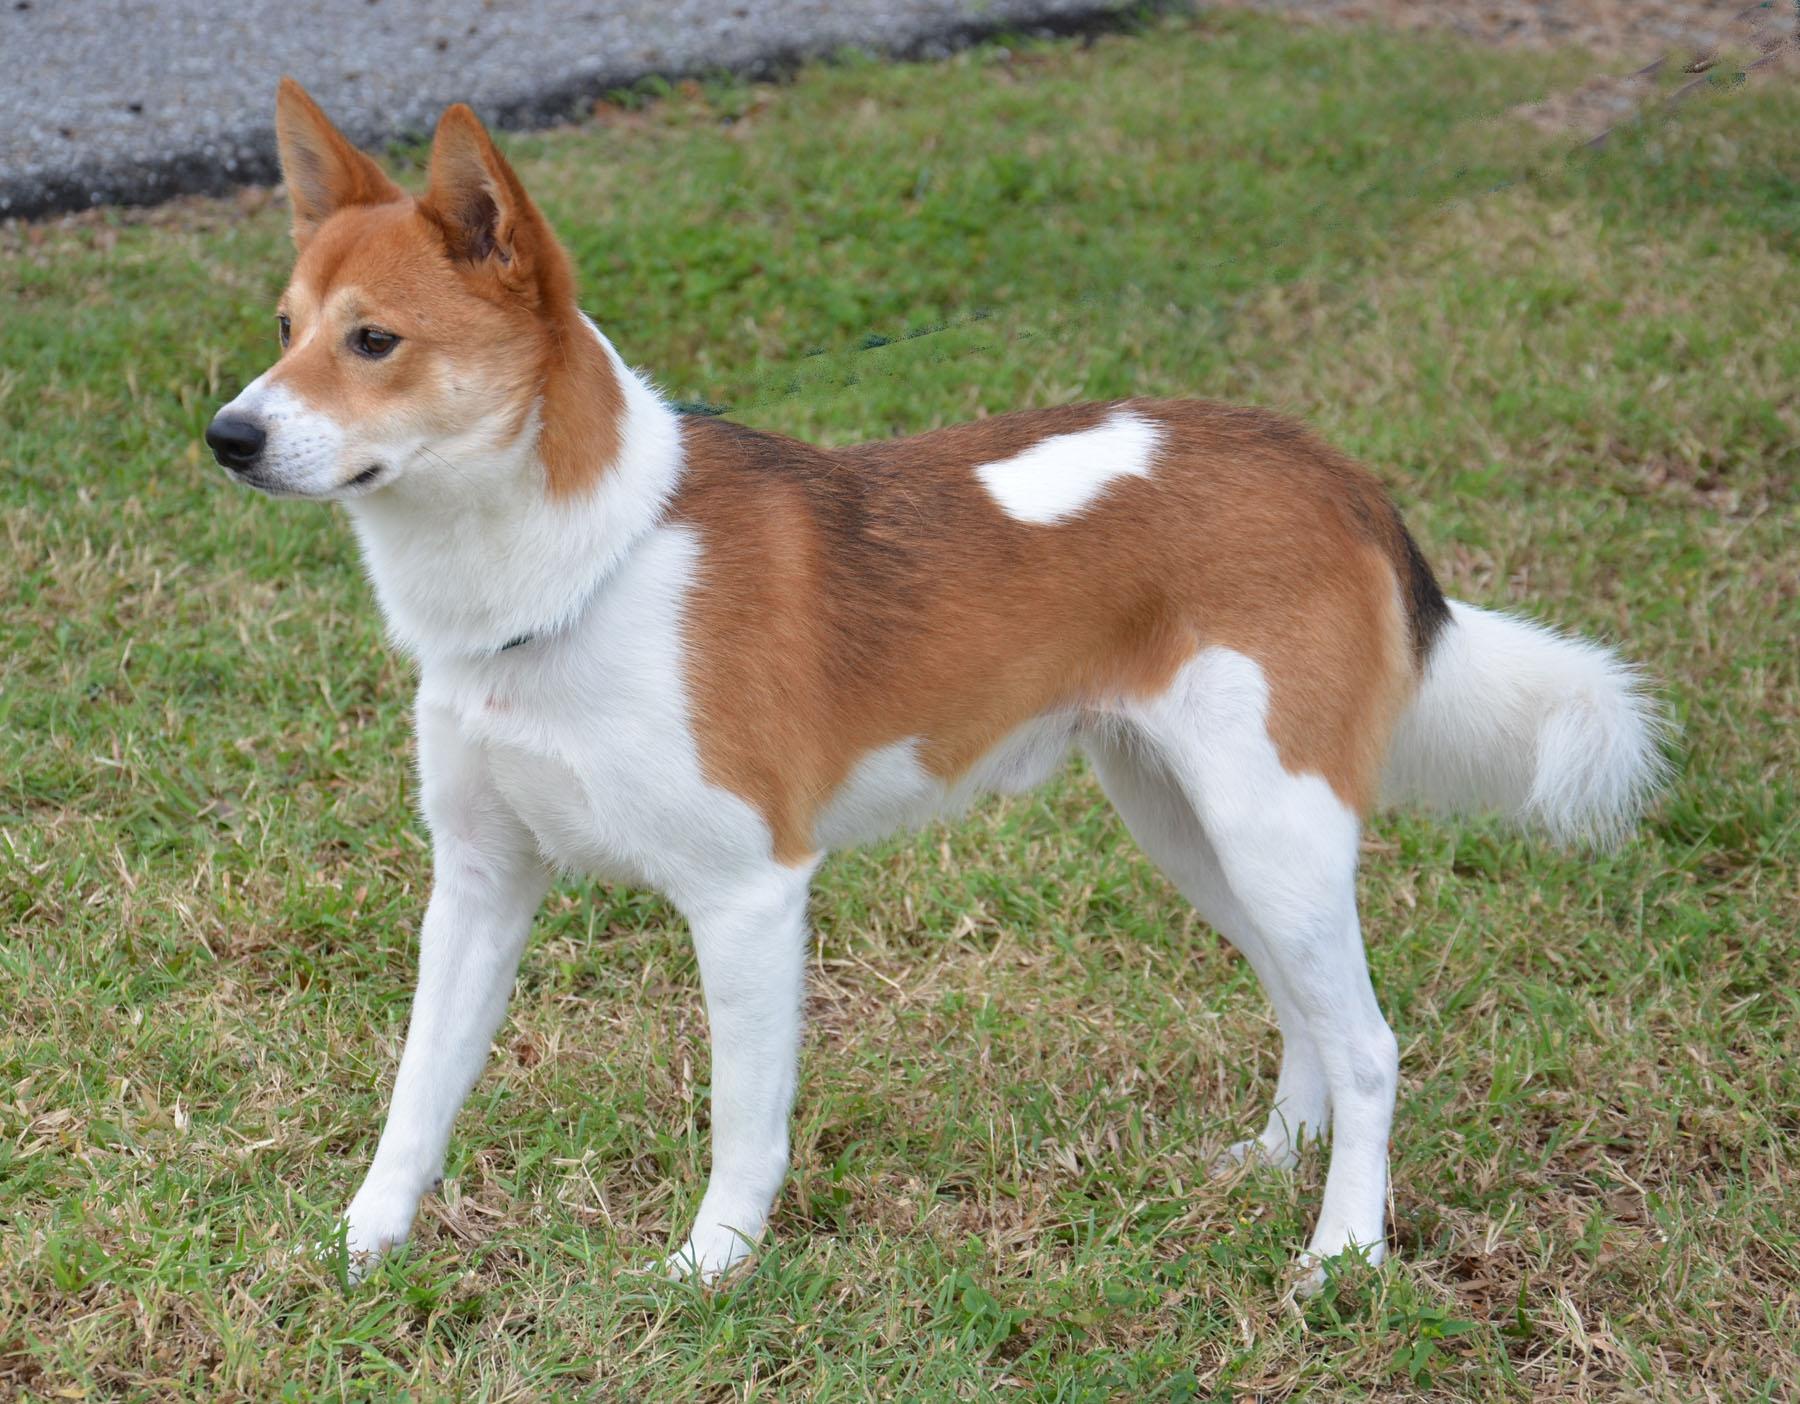 Shiba Inu/Husky Mix Dogs, but mostly just huskies